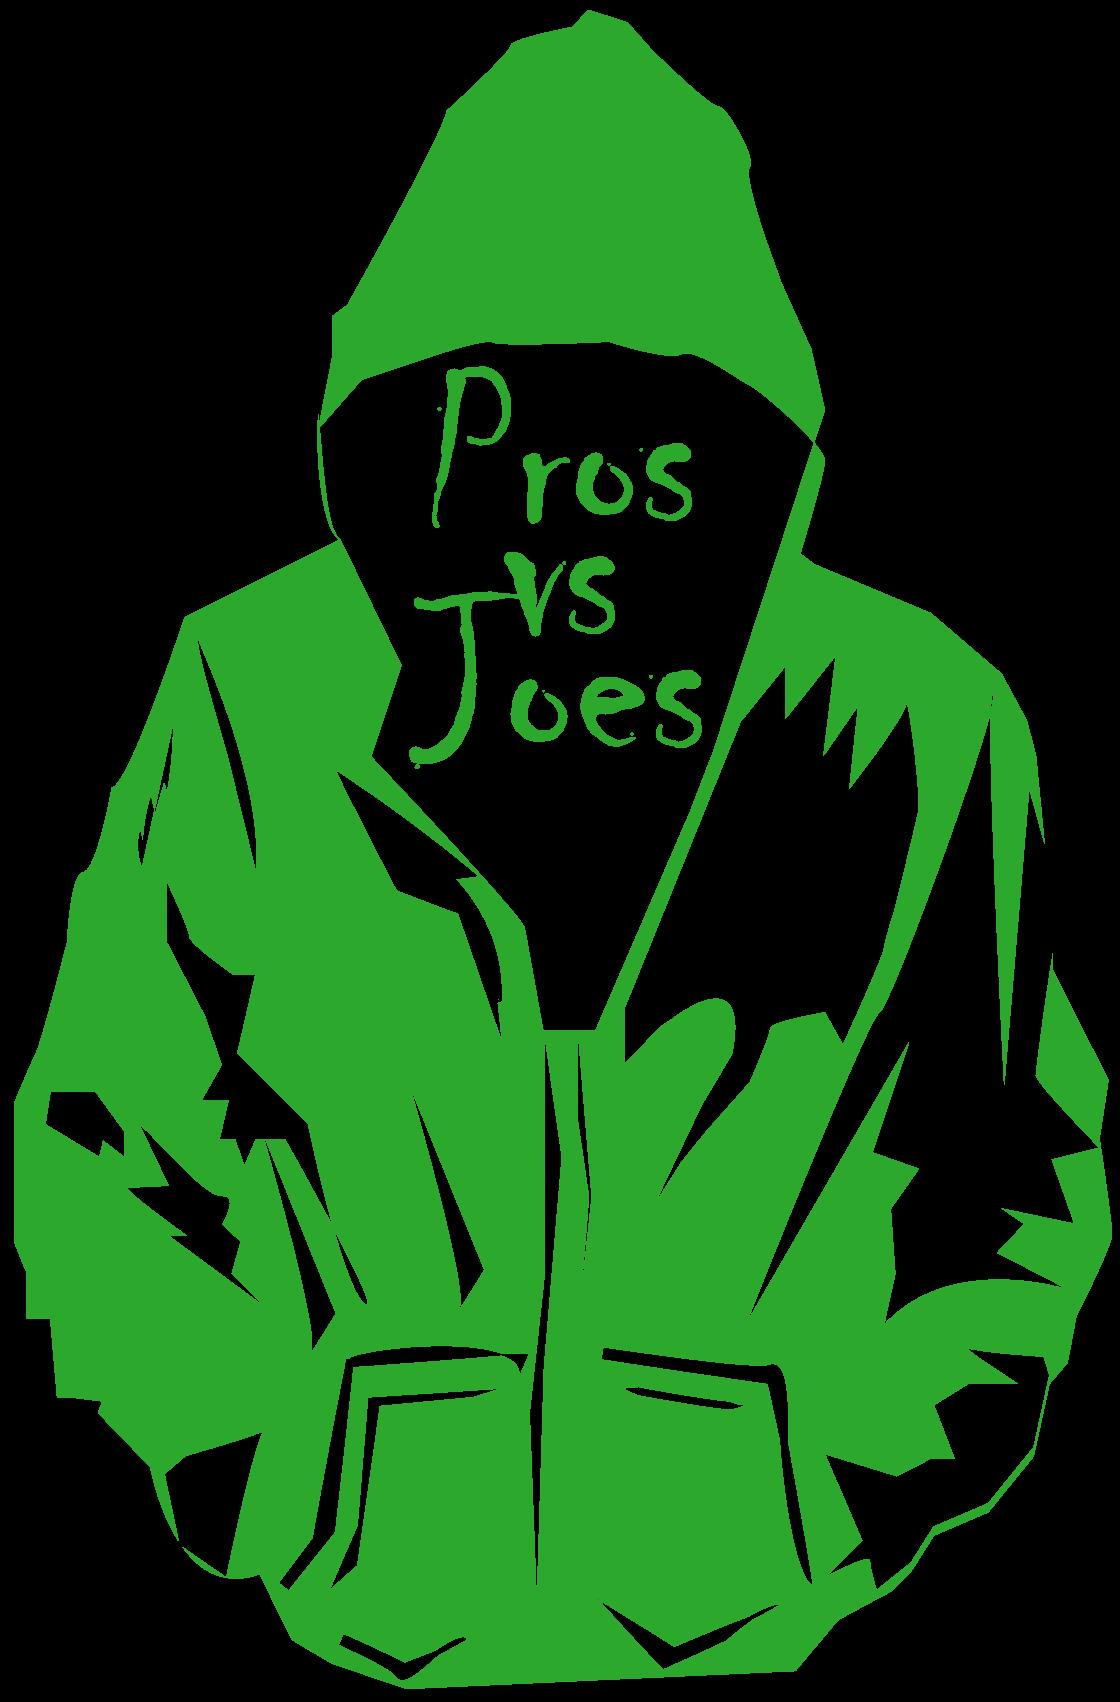 ProsVJoes CTF